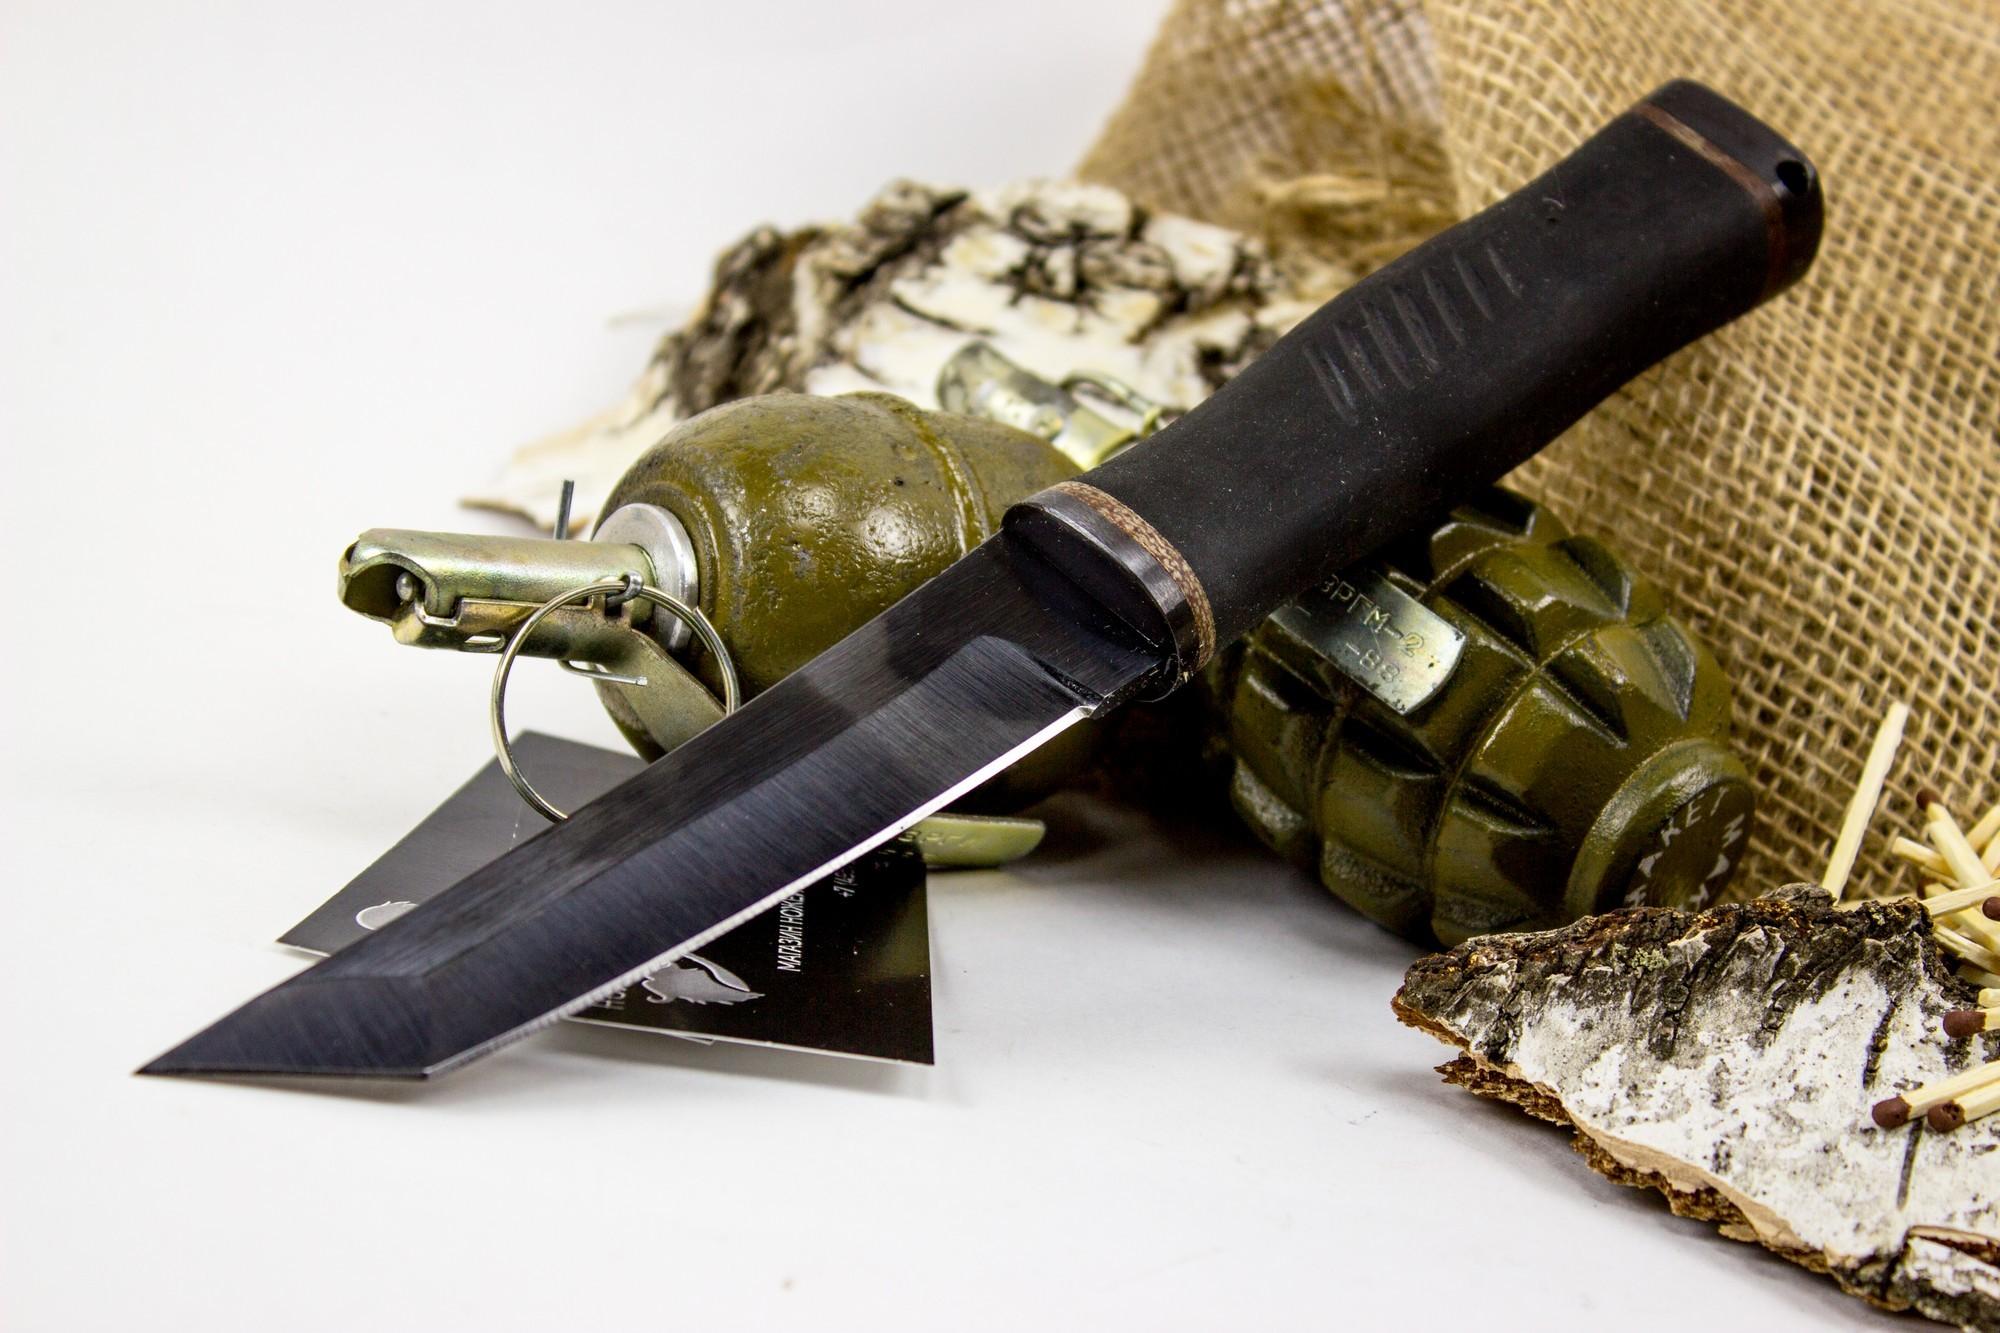 Фото 6 - Нож Кабан-1М, сталь 65Г, резина от Титов и Солдатова